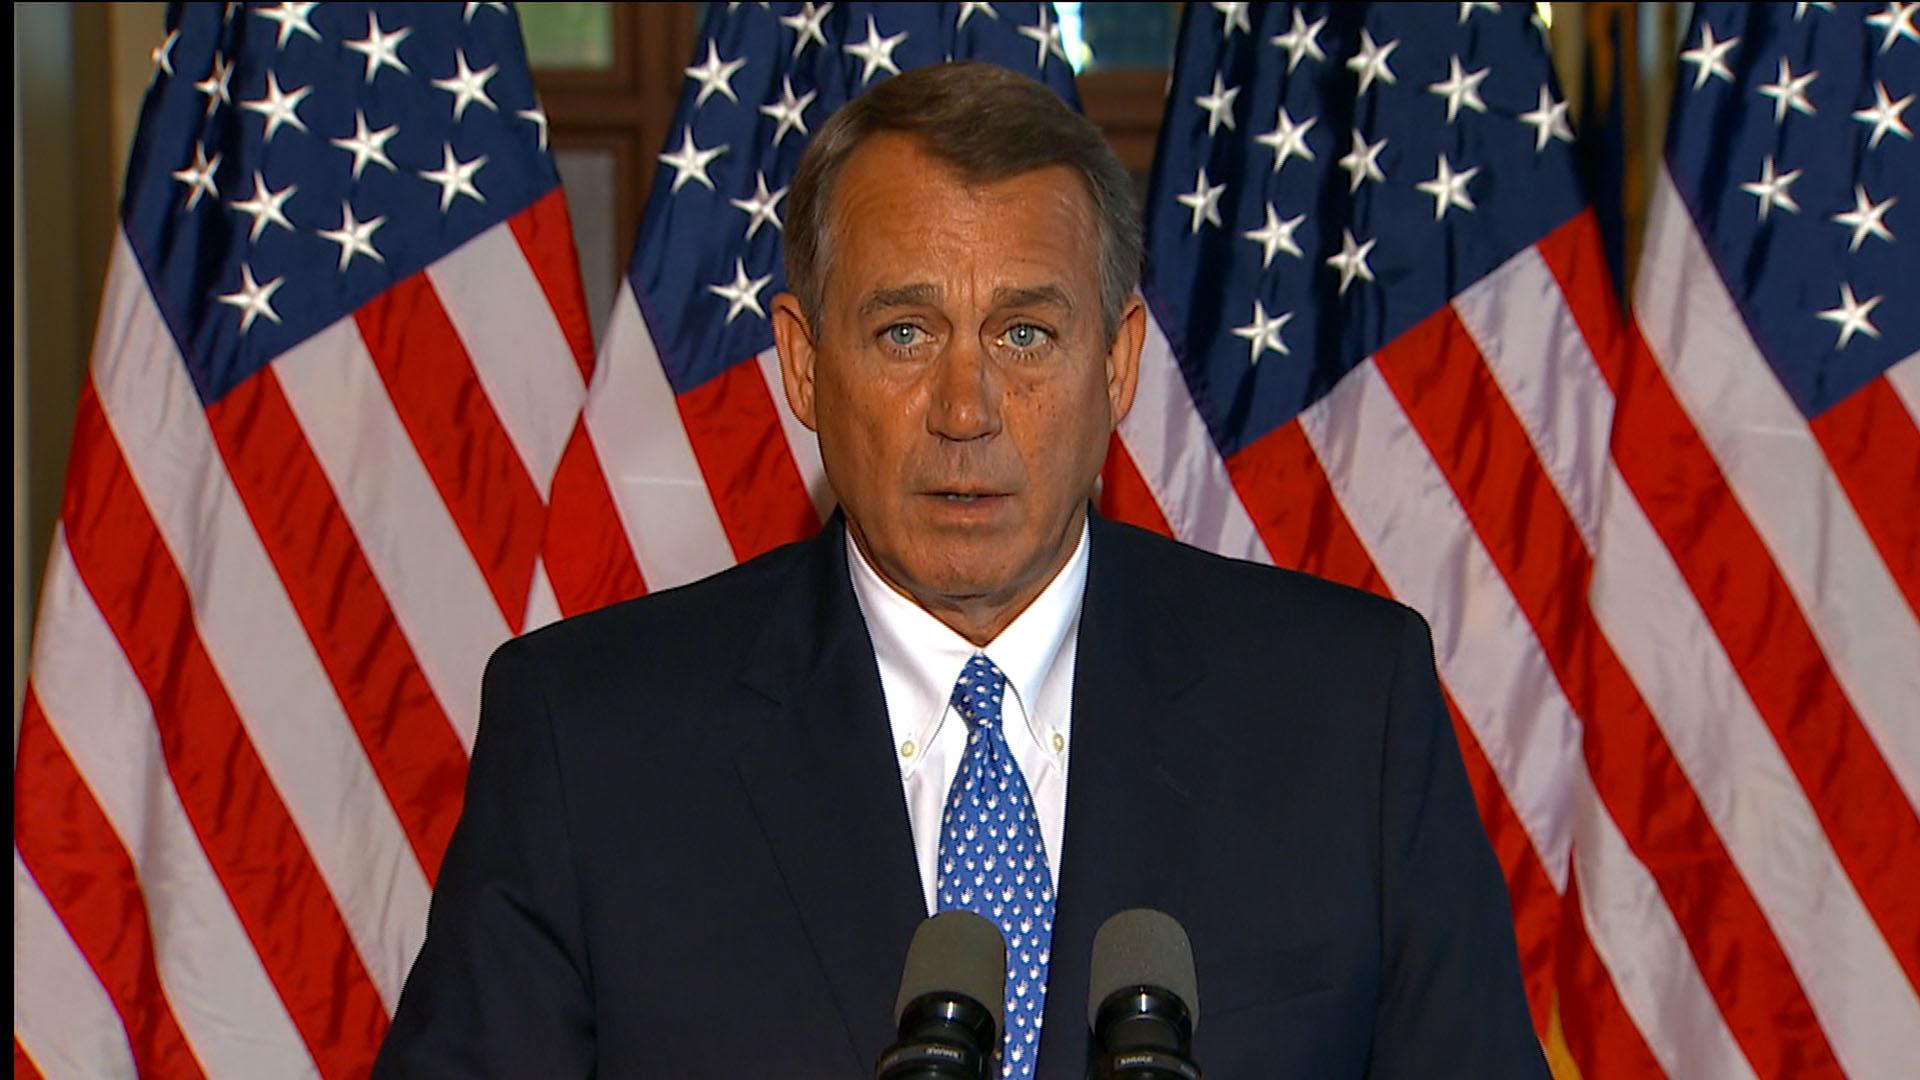 Boehner's new debt ceiling ultimatum